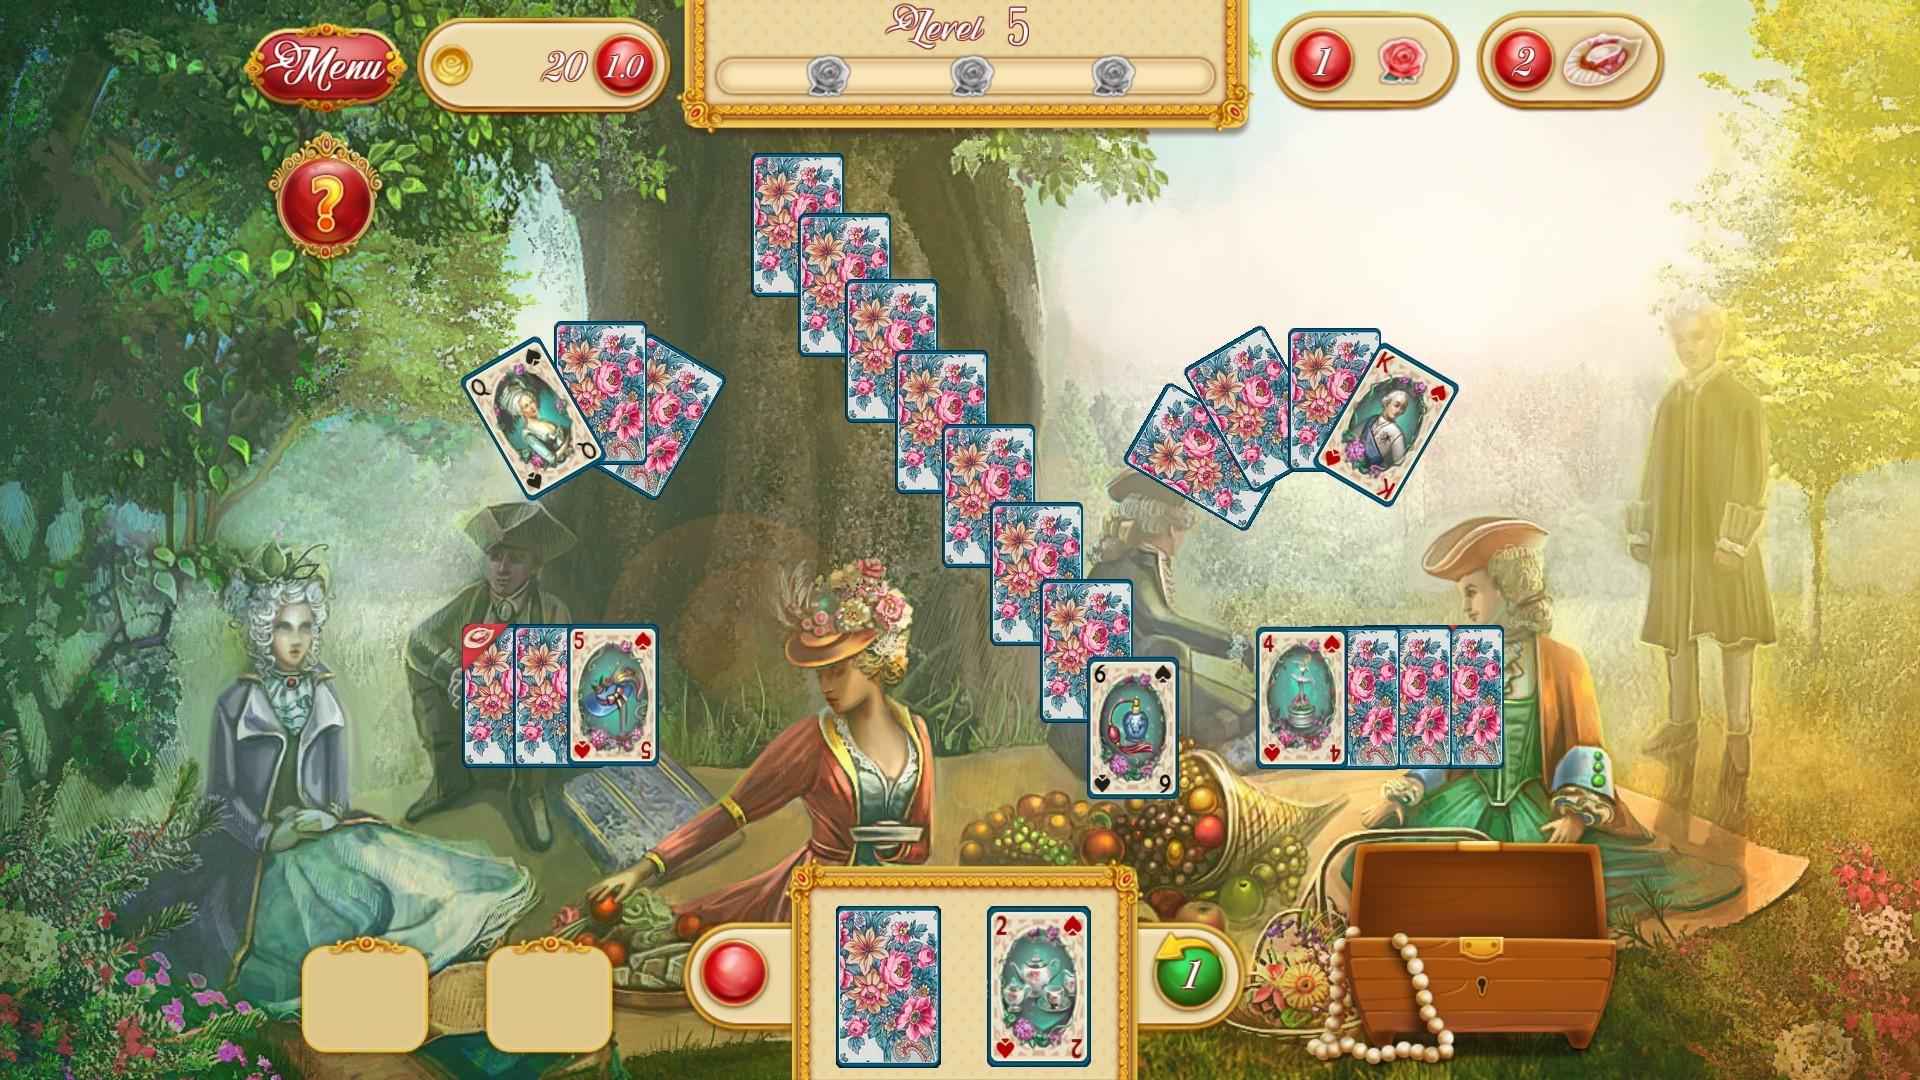 Marie Antoinette's Solitaire screenshot